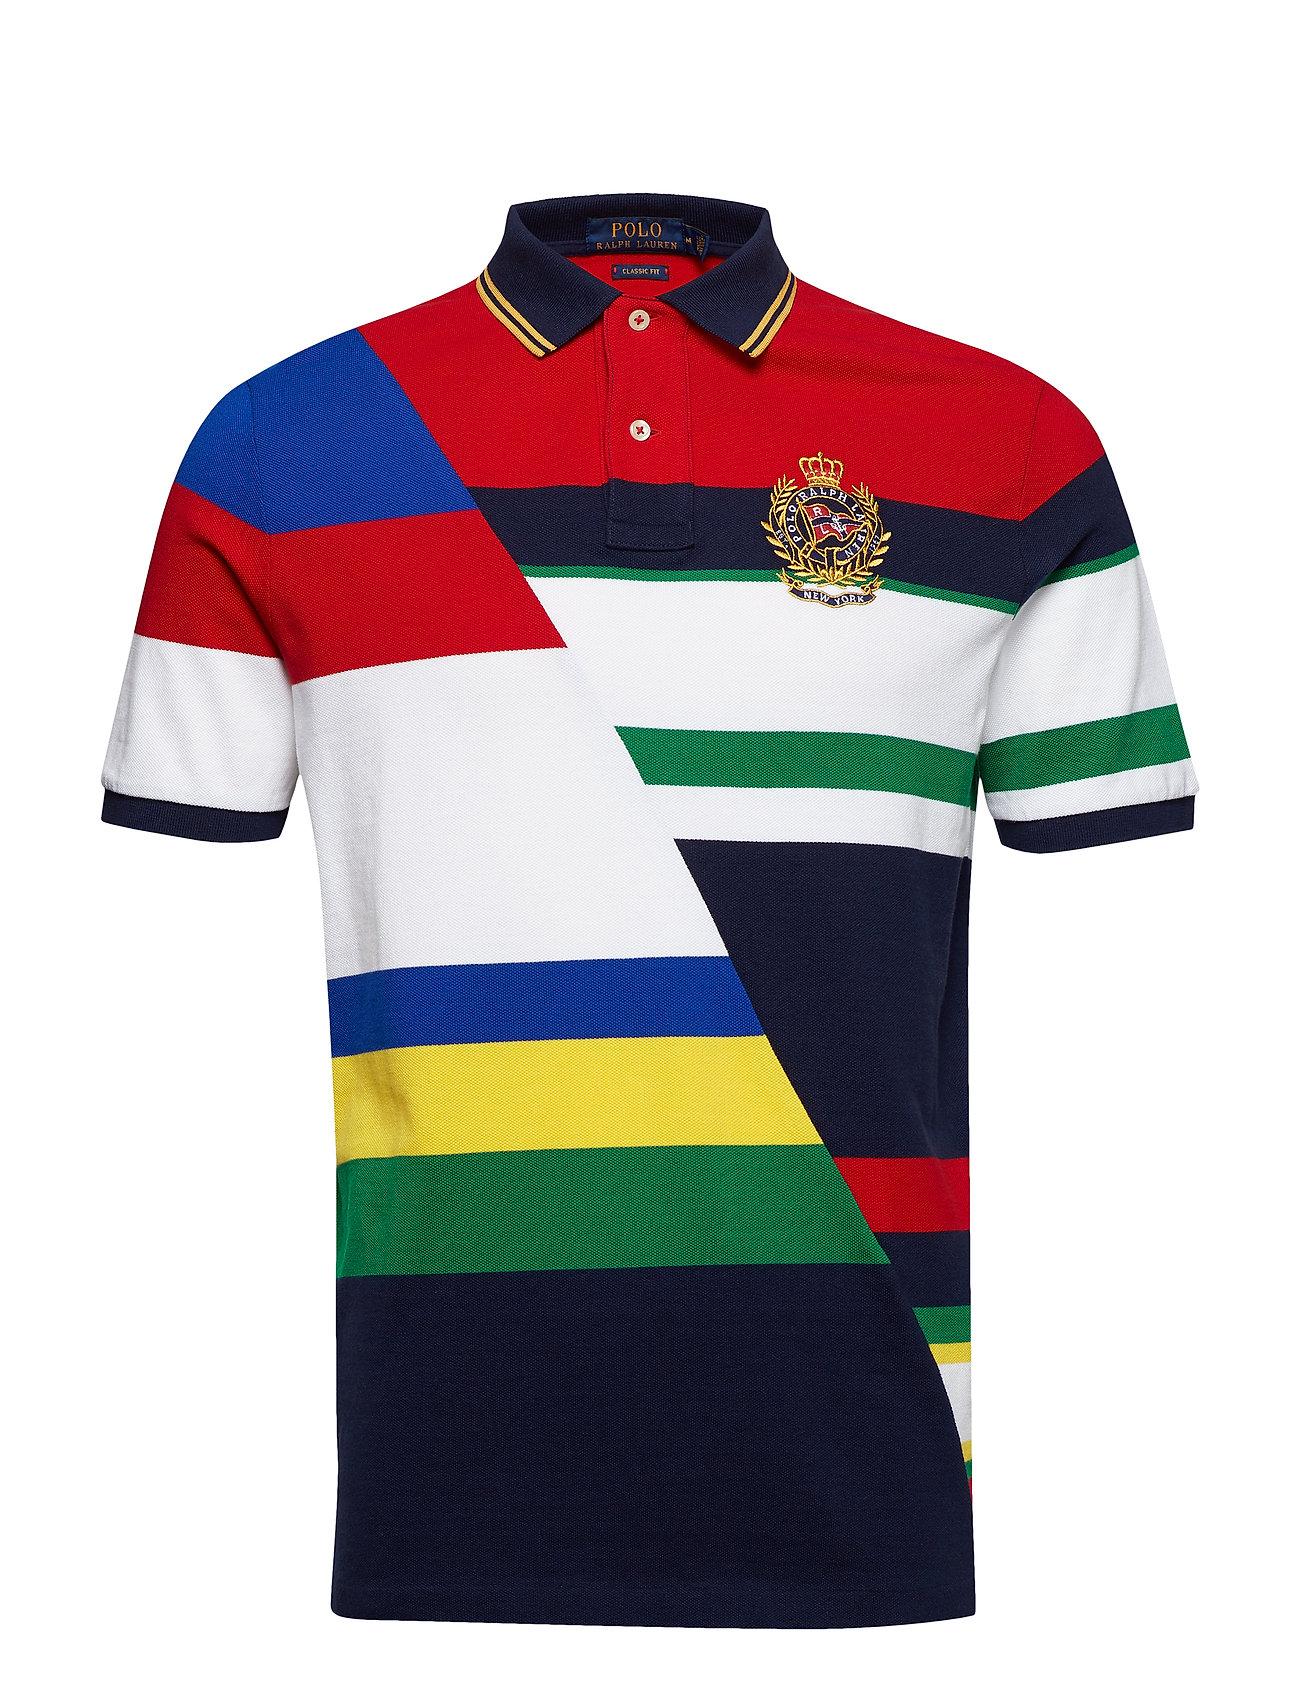 c4558c9b0abc Sskccls M2-short Sleeve-knit (Cruise Navy Multi) (£108) - Polo Ralph ...